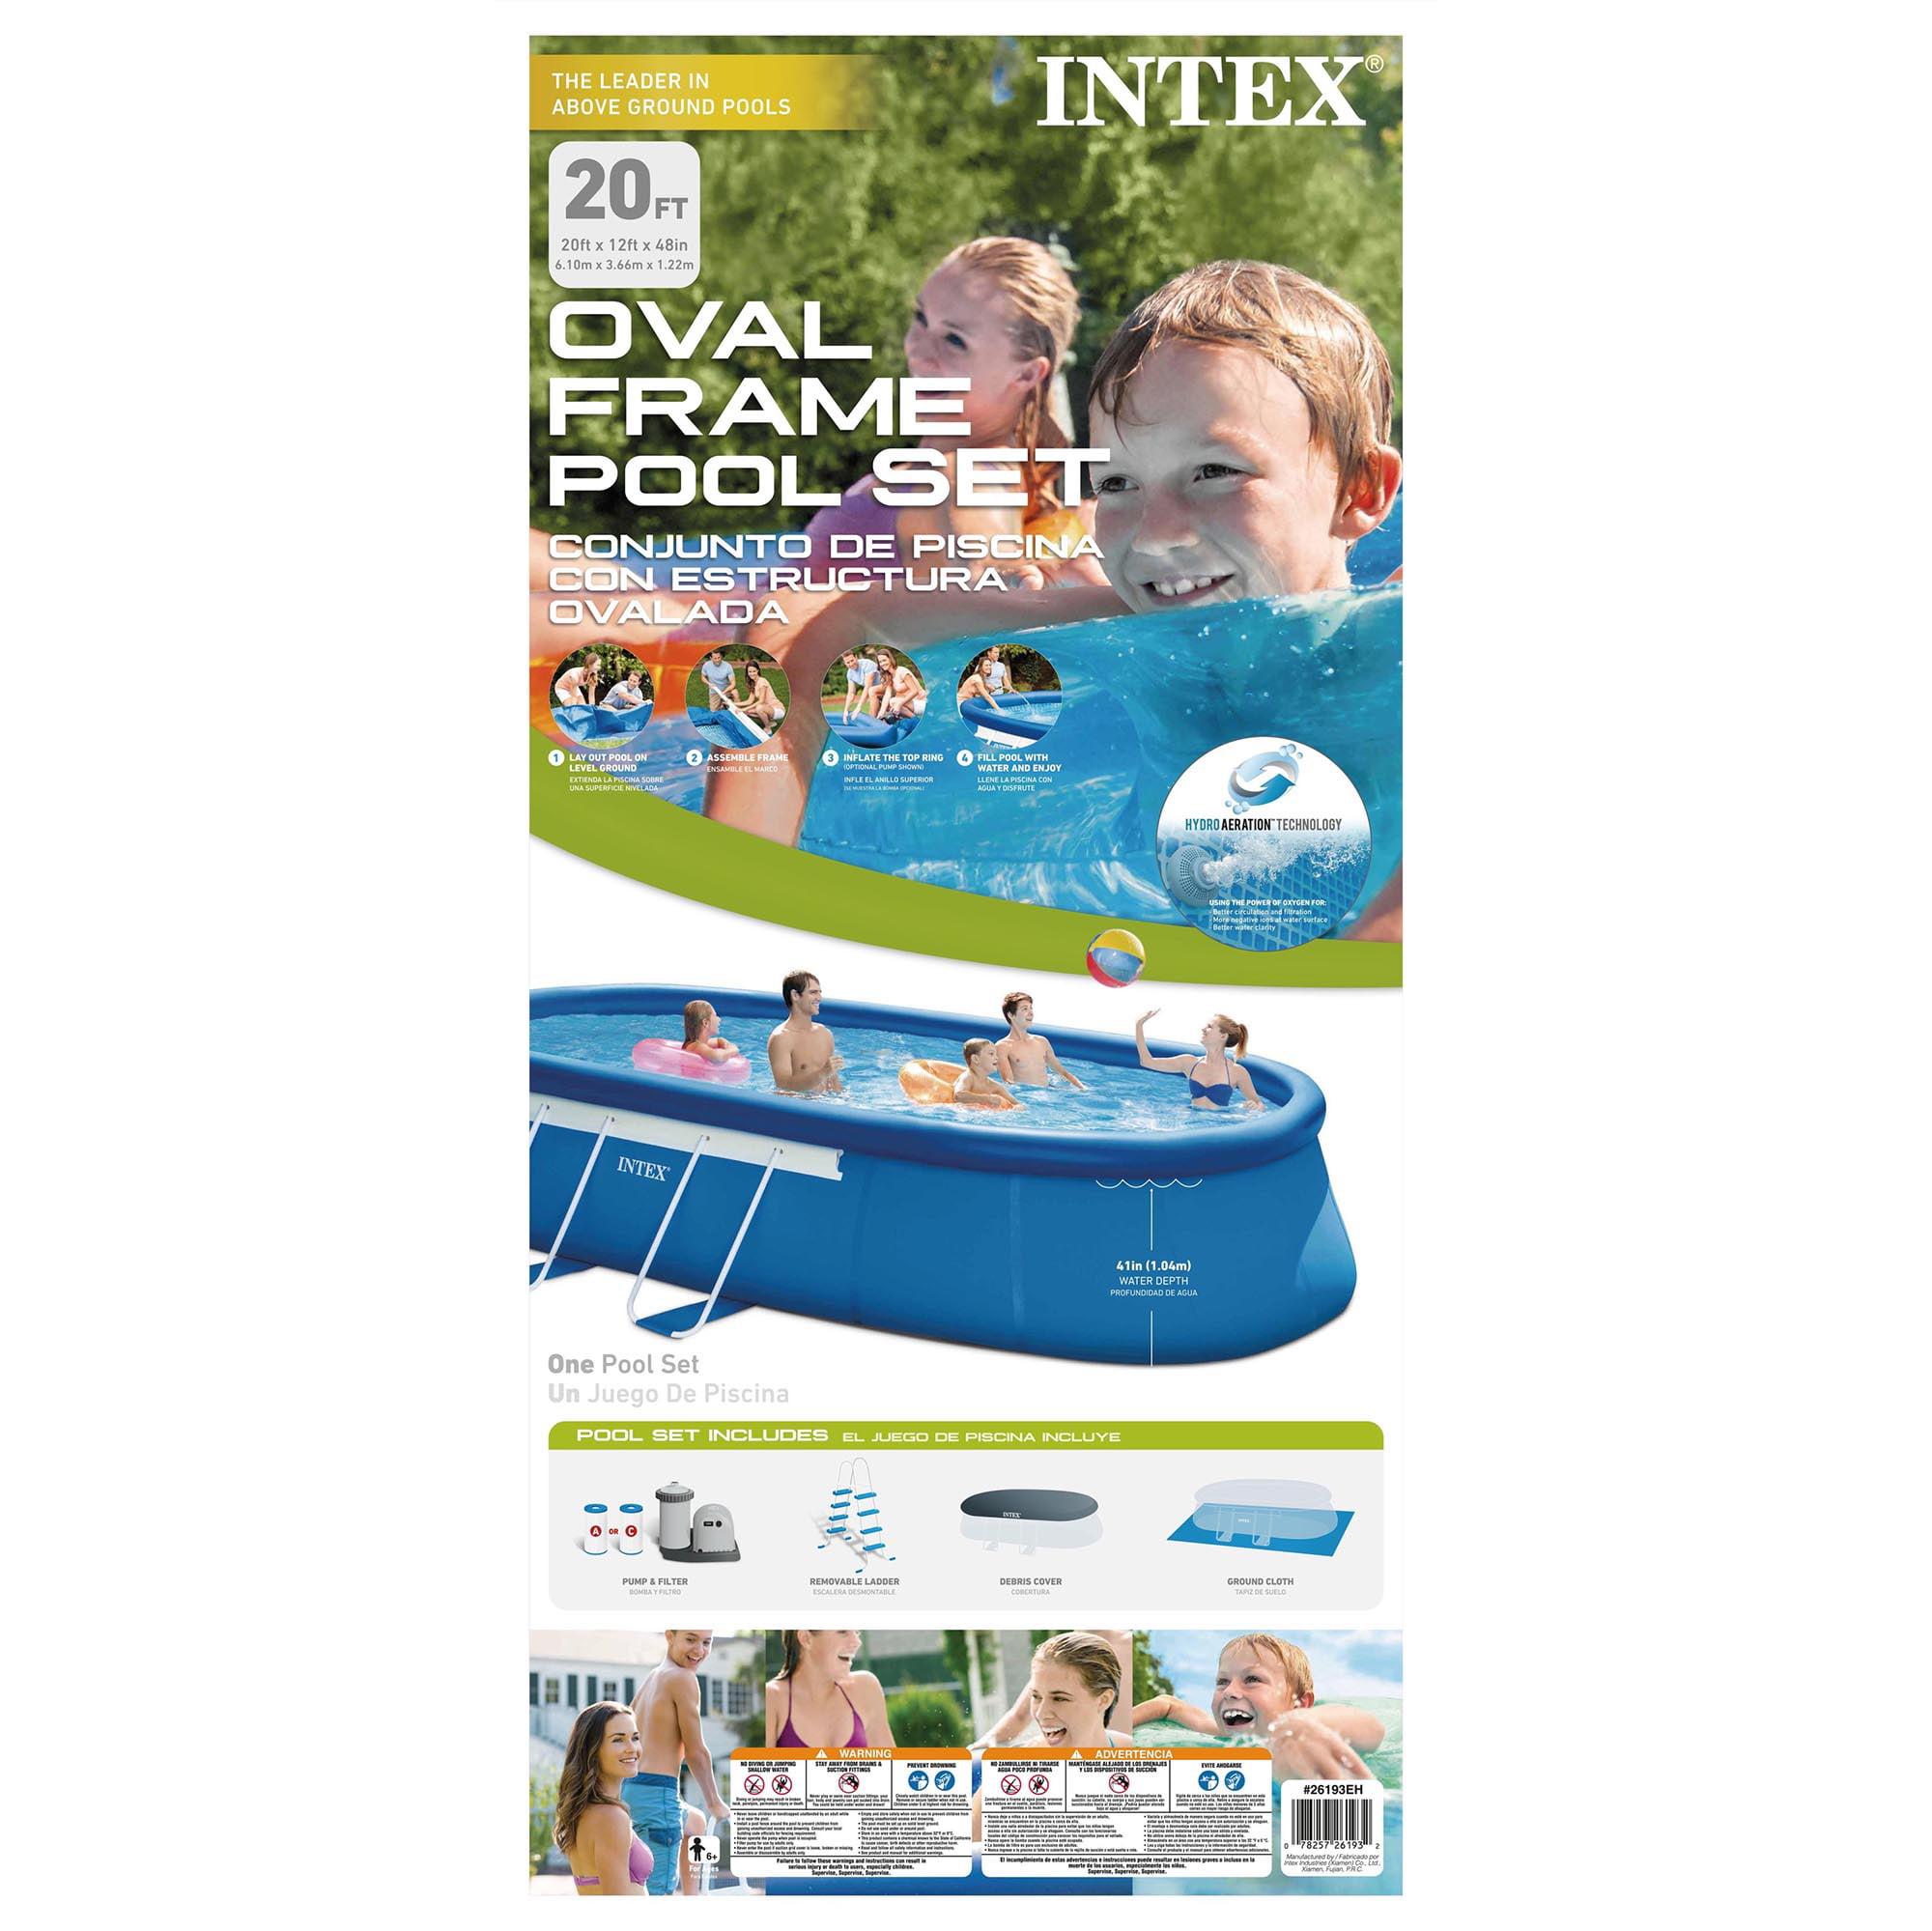 Intex - Oval Frame Pool Set with Filter, 20 Feet x 12 Feet x 48 ...